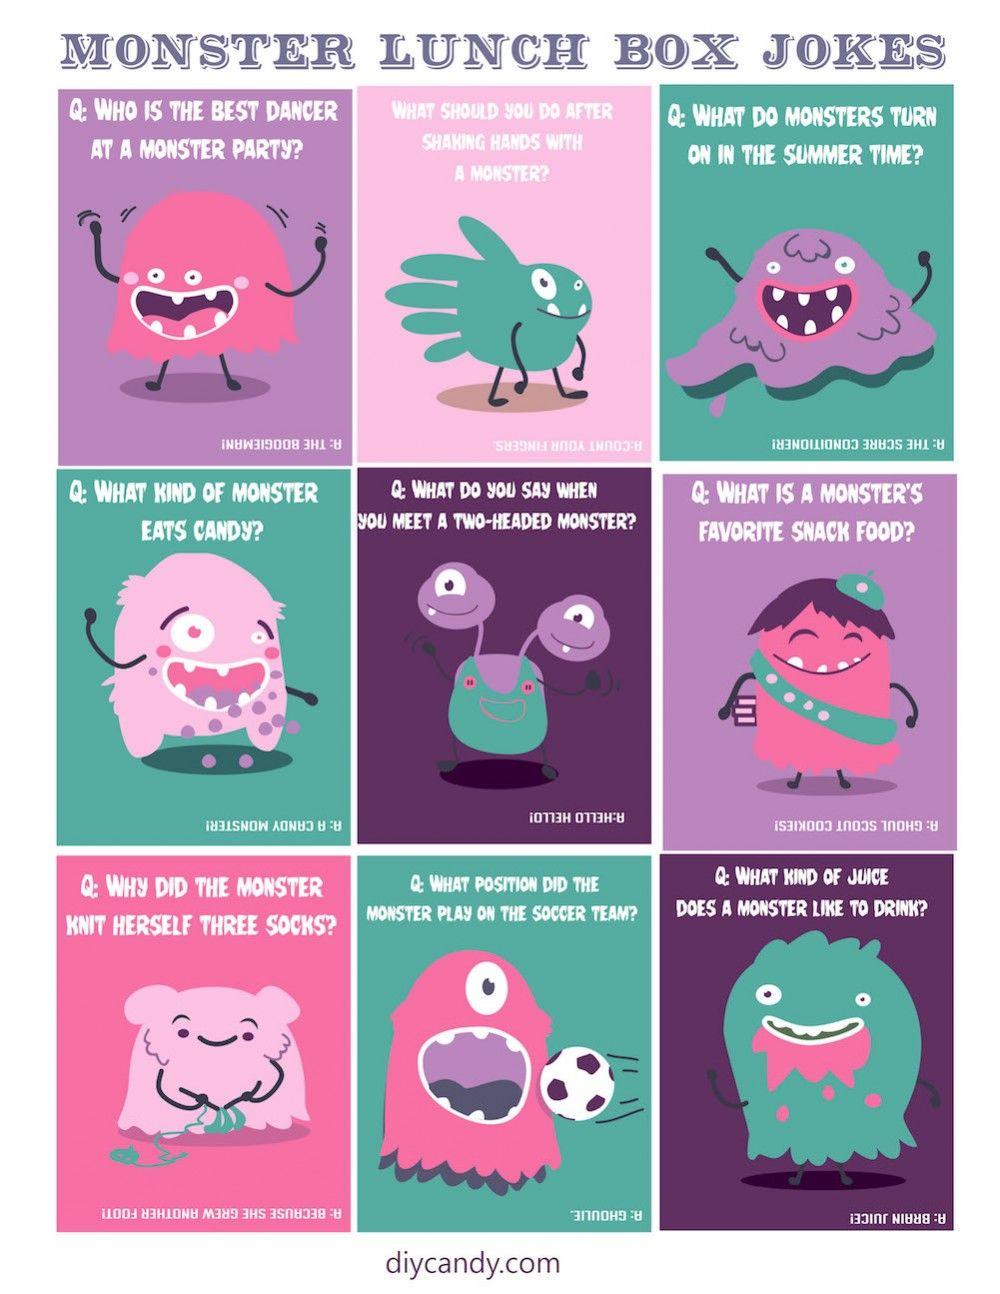 Cute Monster Lunch Box Jokes